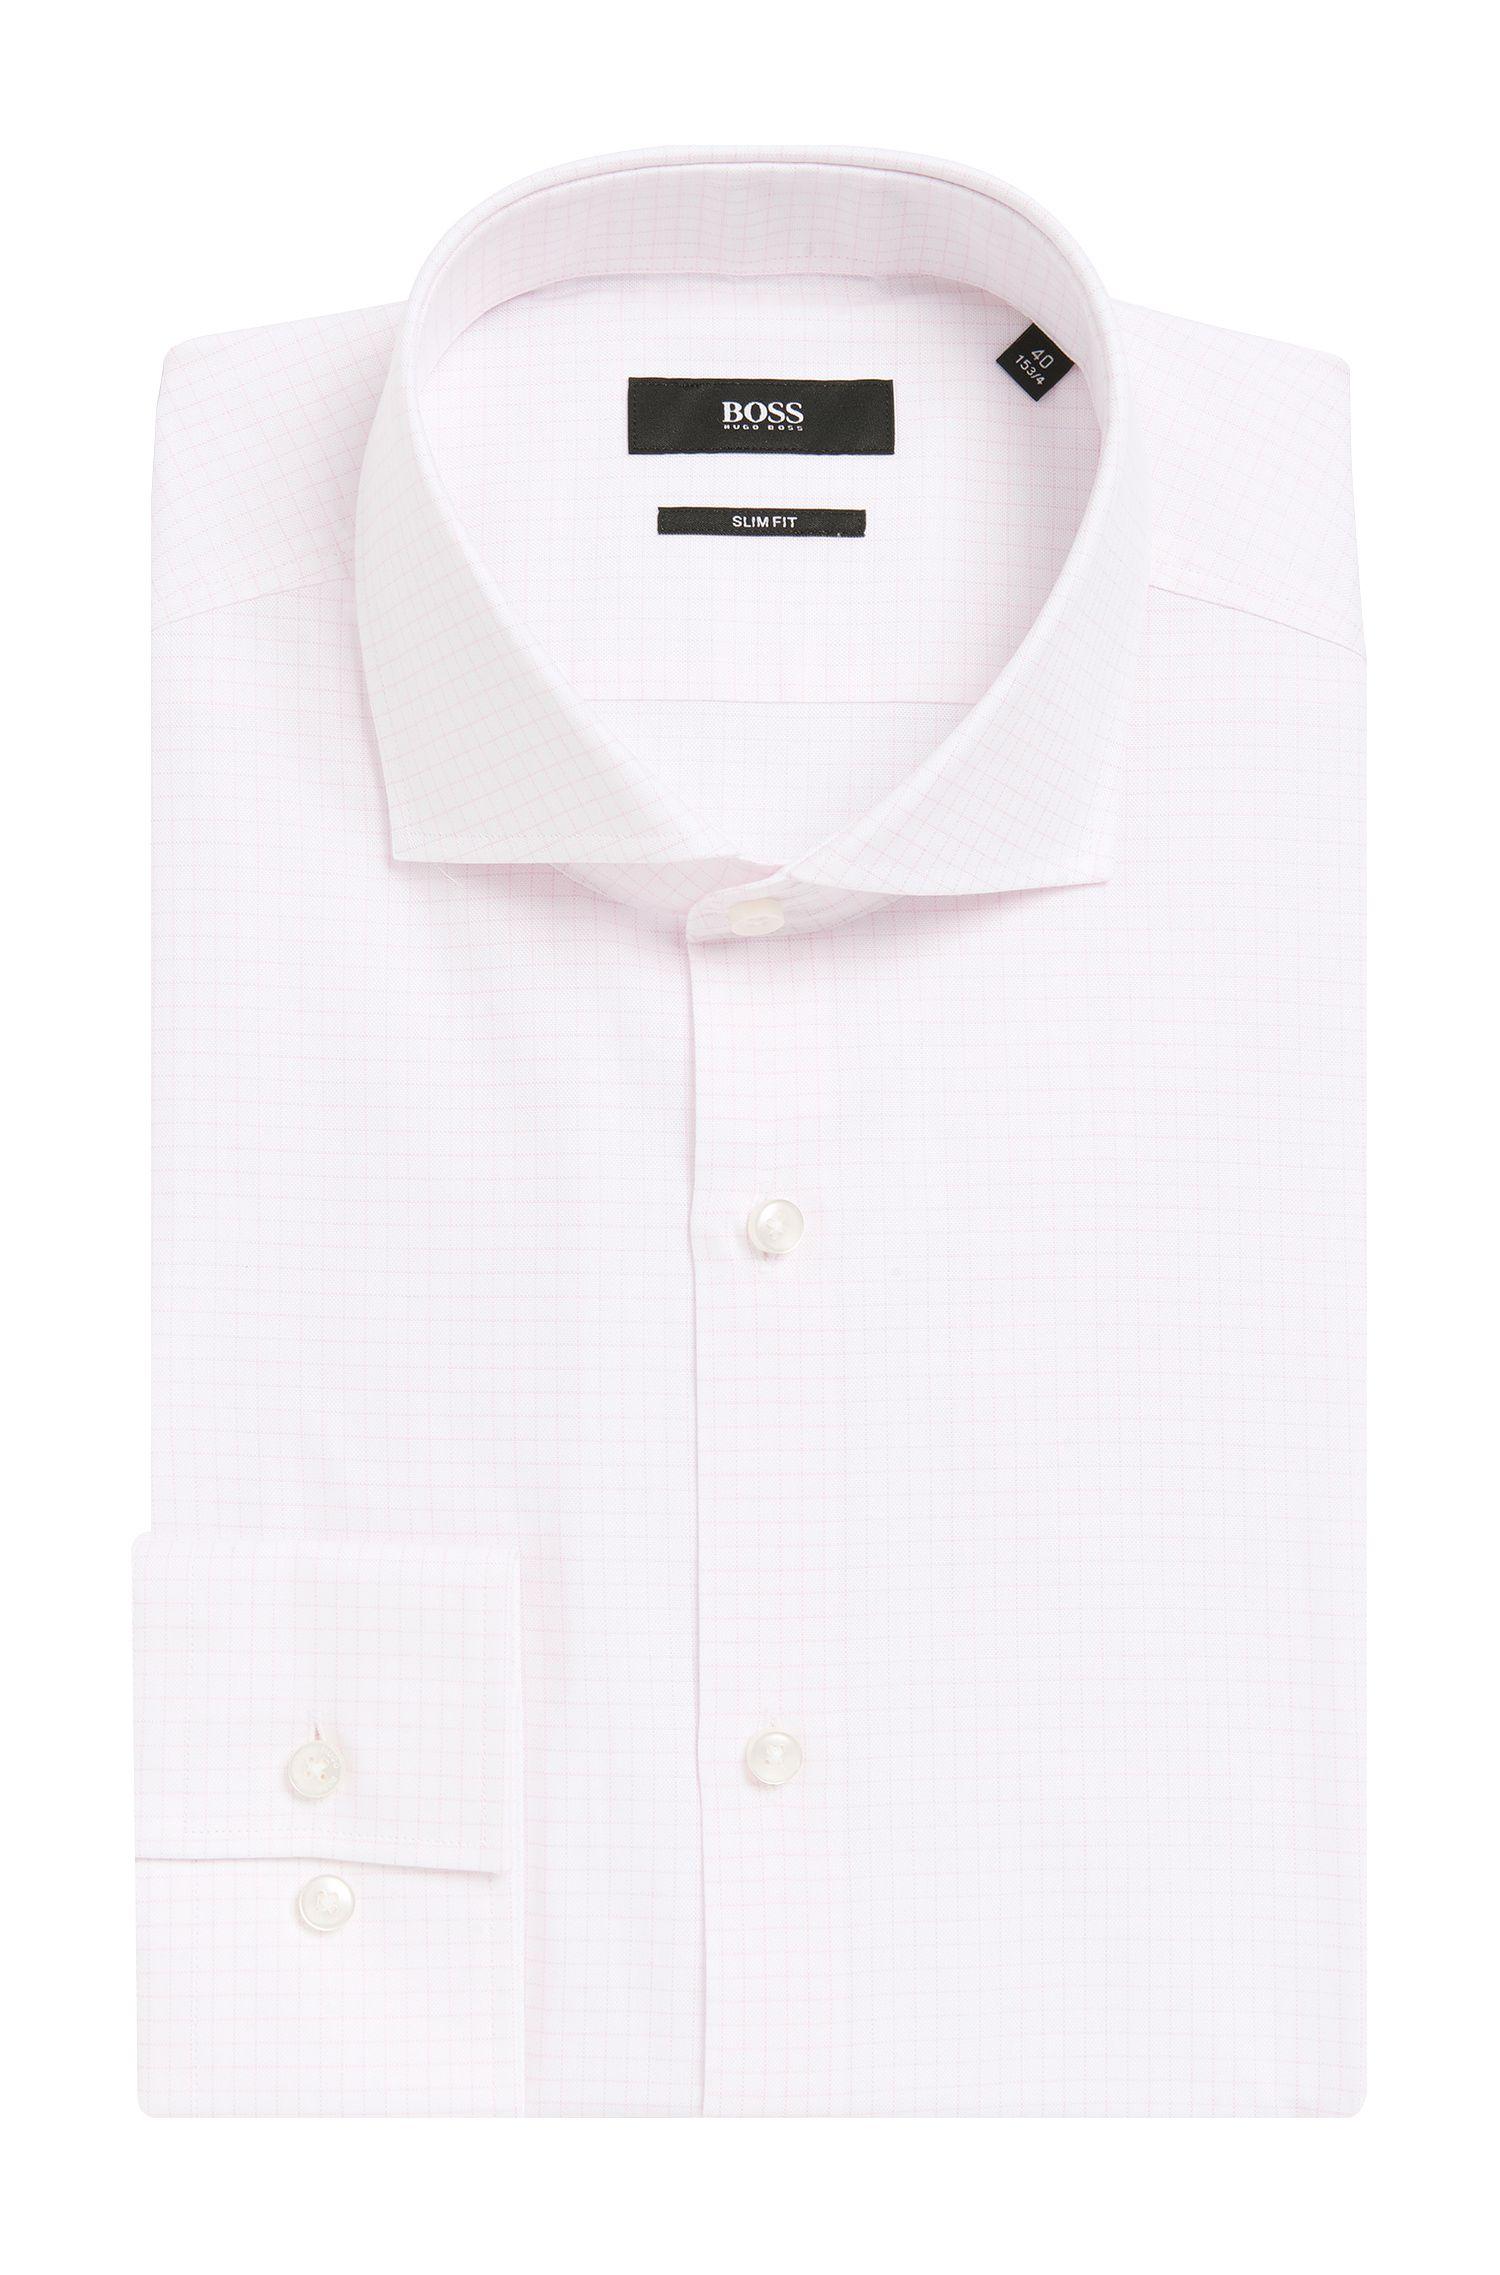 Grid Check Cotton Dress Shirt,Slim Fit | Jason